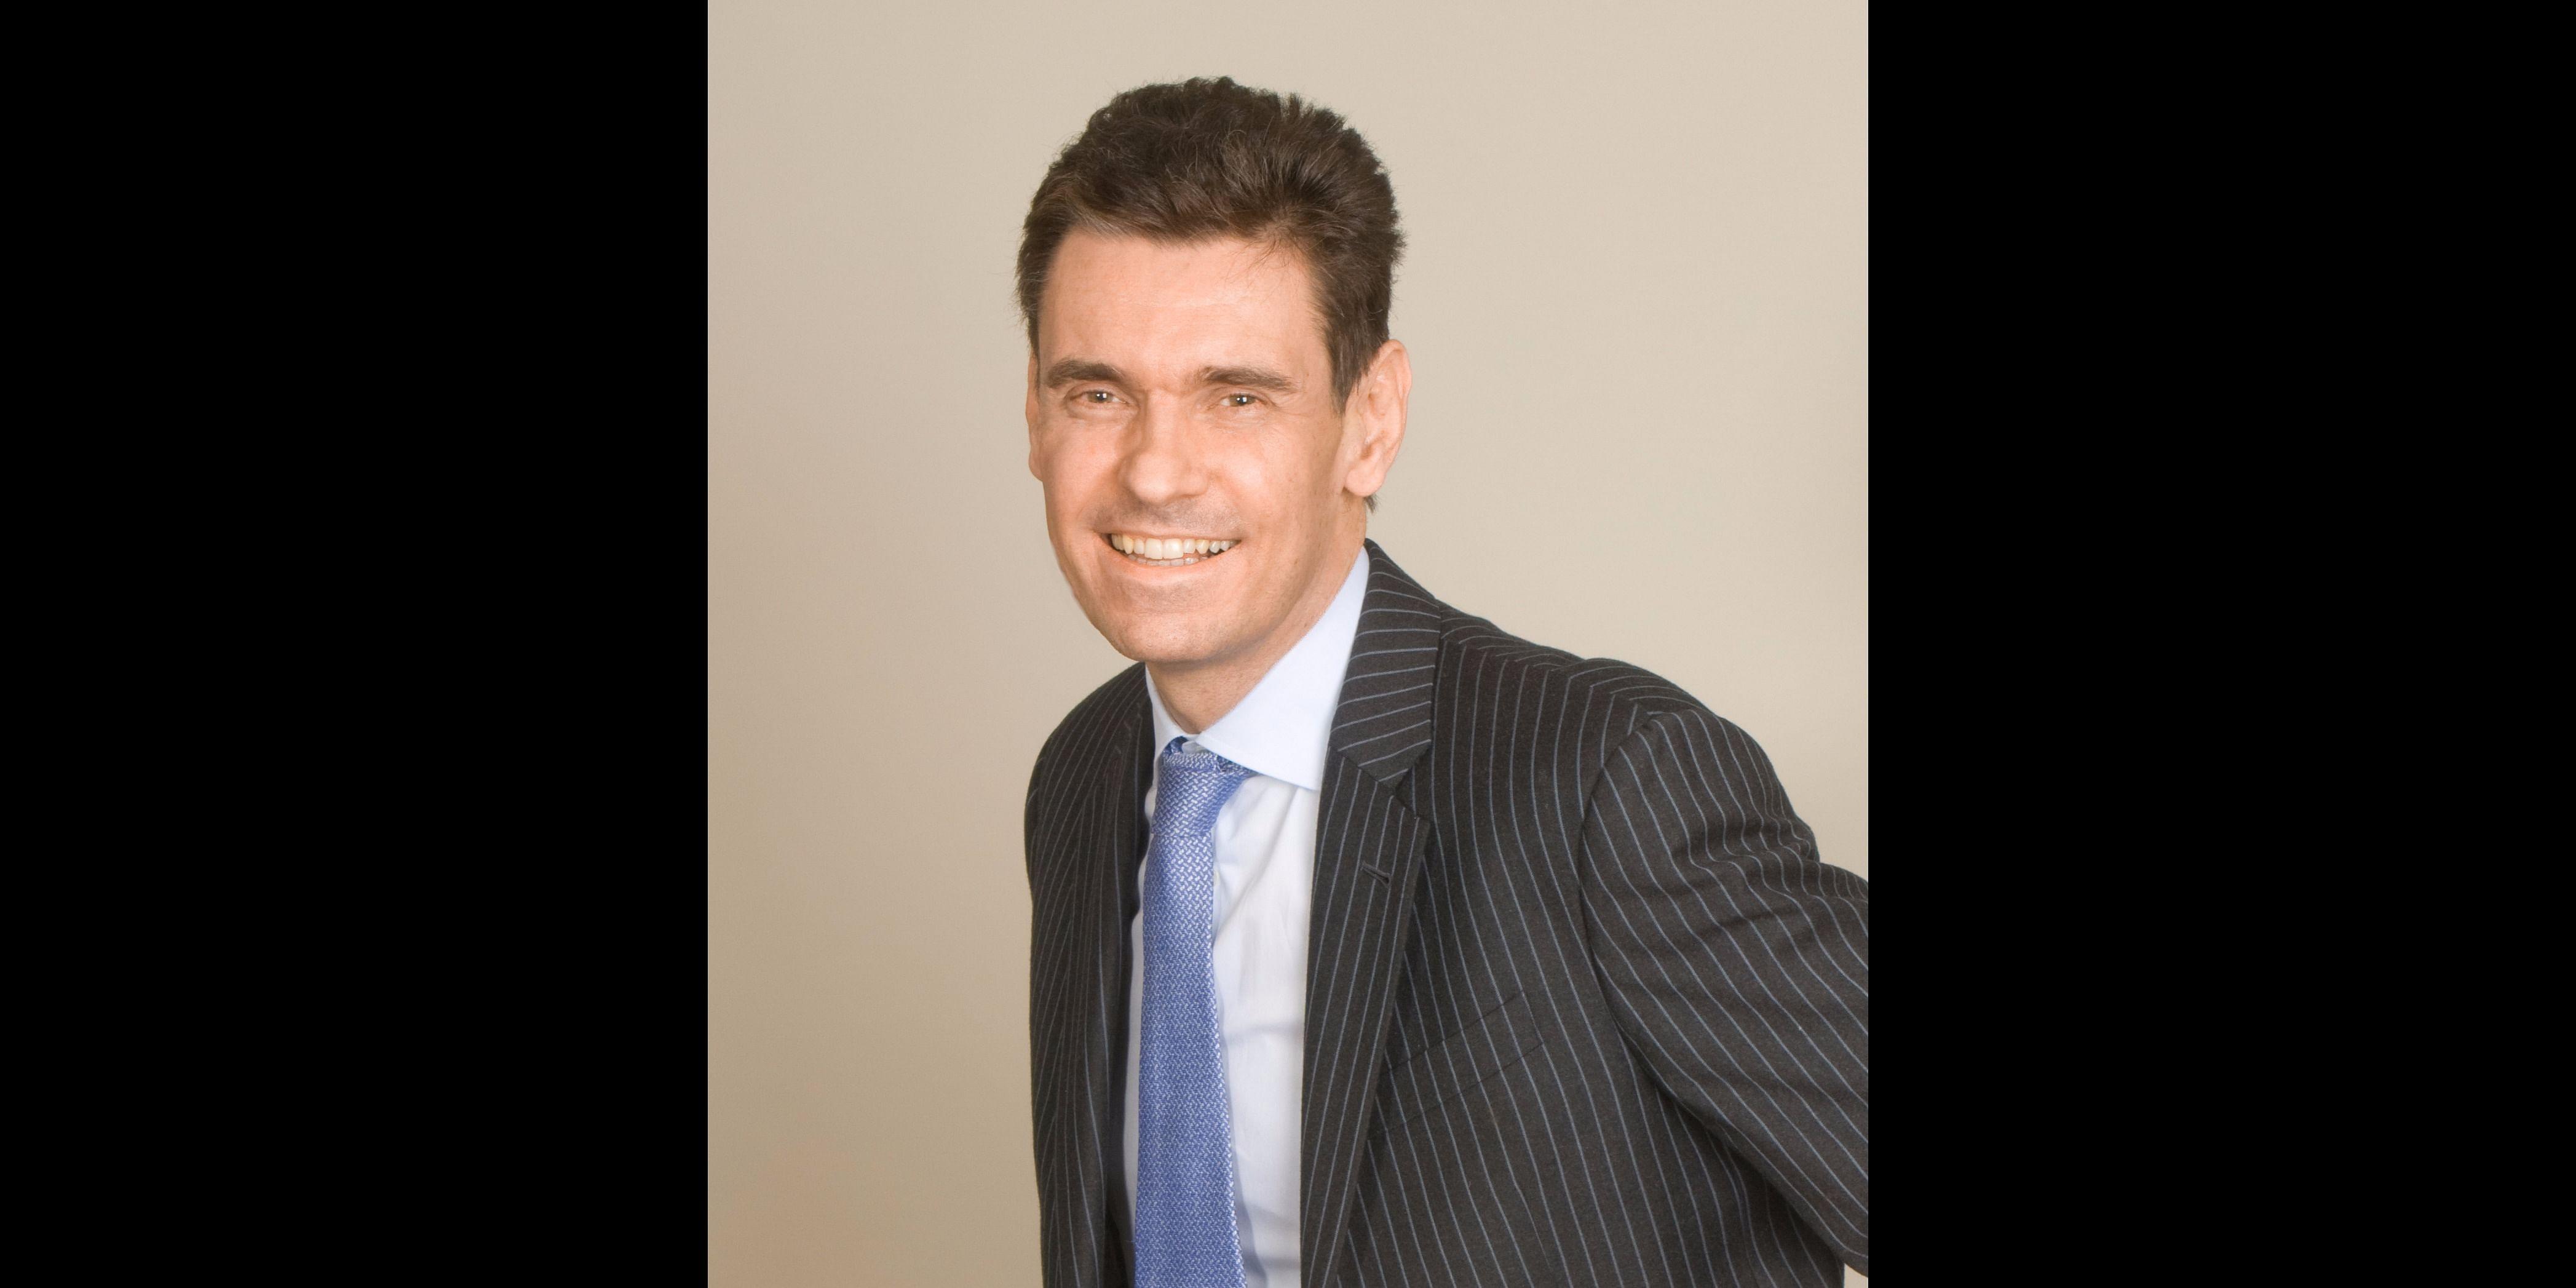 Mr. Mark Davies, Global Chairman of Davies & Associates, LLC